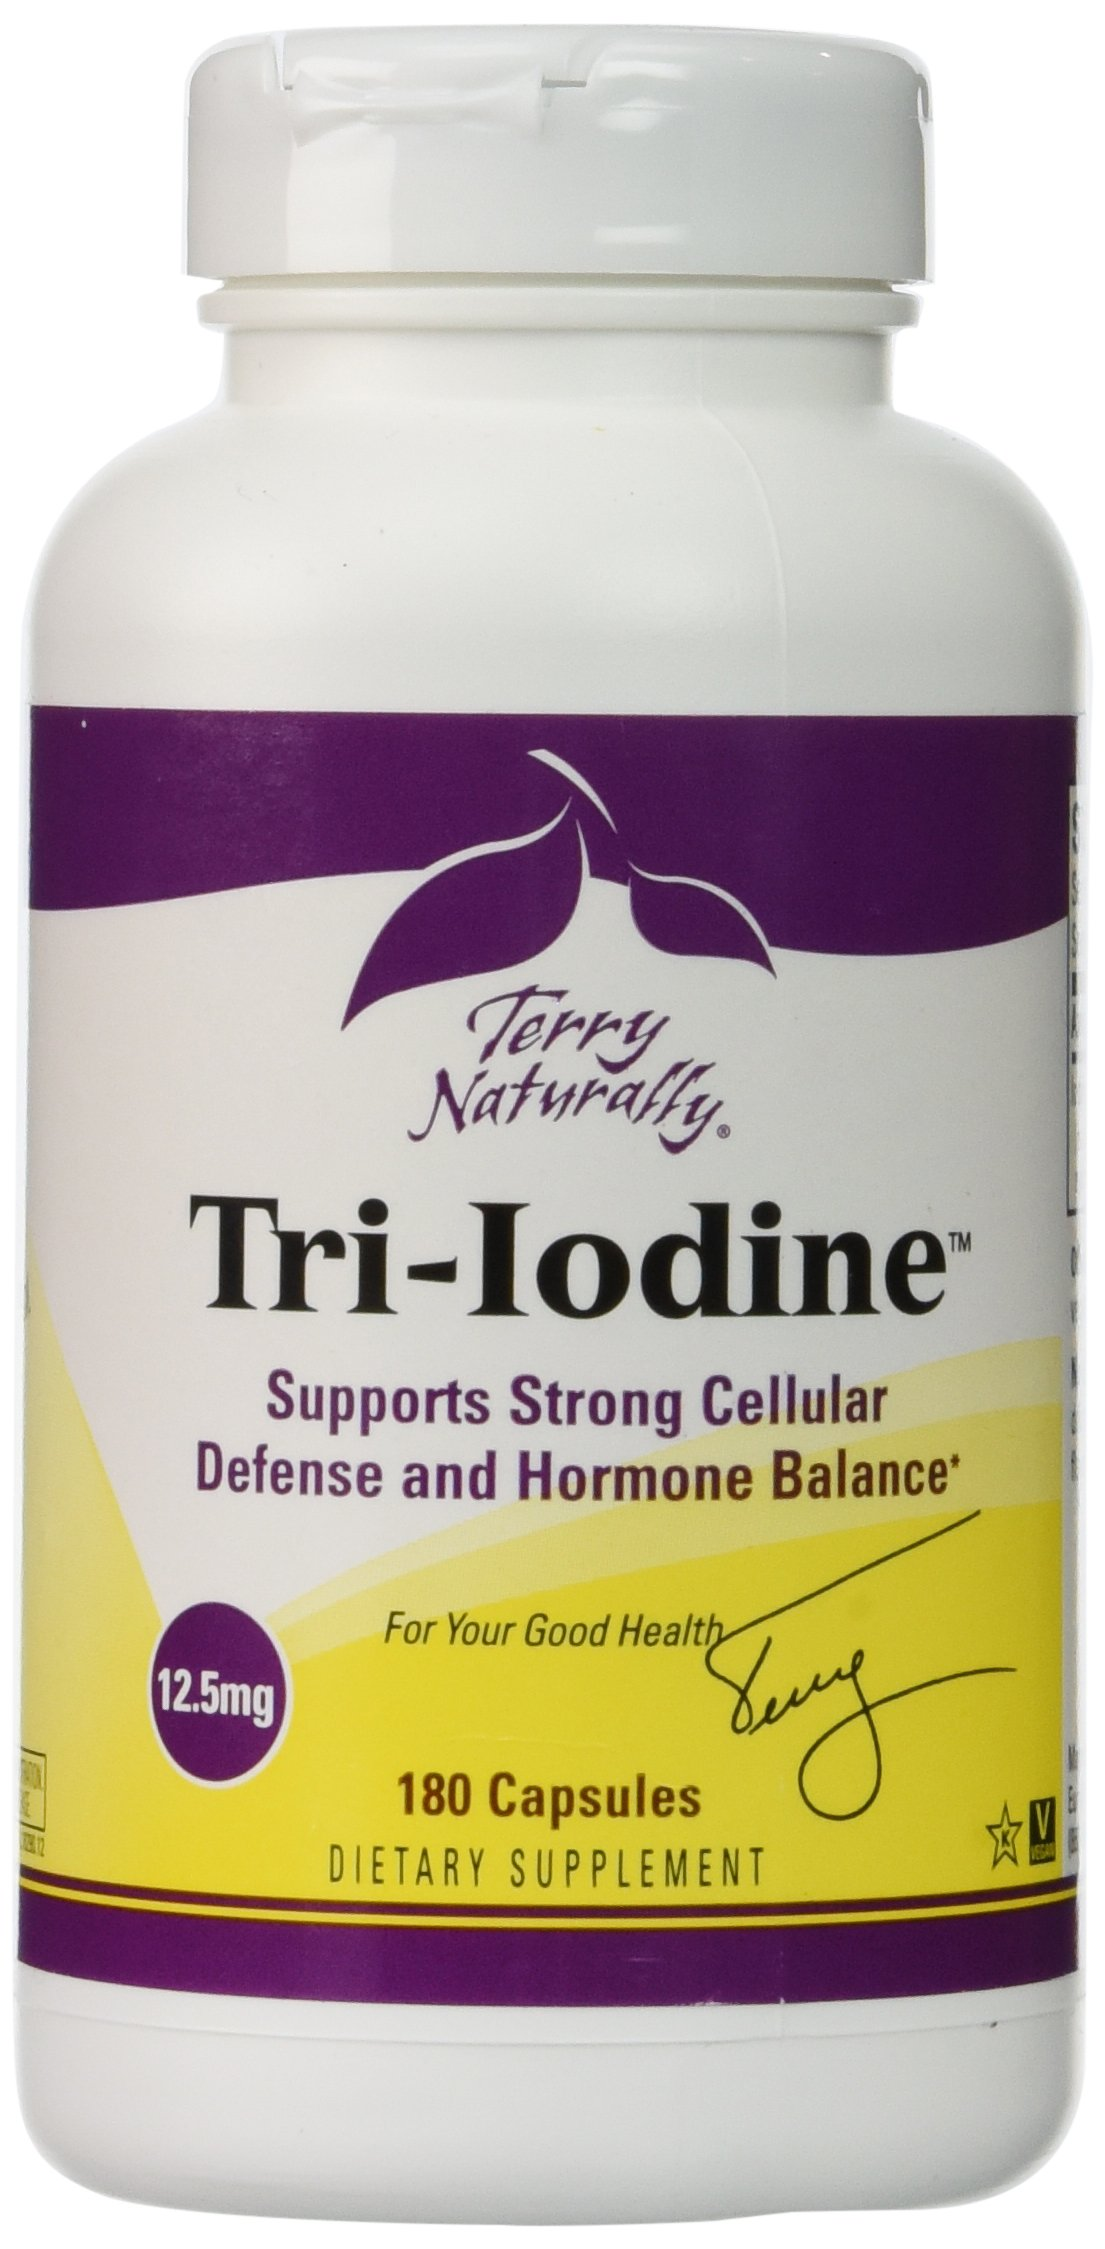 Terry Naturally Tri-Iodine 12.5 mg - 12500 mcg Iodine, 180 Vegan Capsules - Supports Hormone Balance, Promotes Breast & Prostate Health - Non-GMO, Gluten-Free, Kosher - 180 Servings